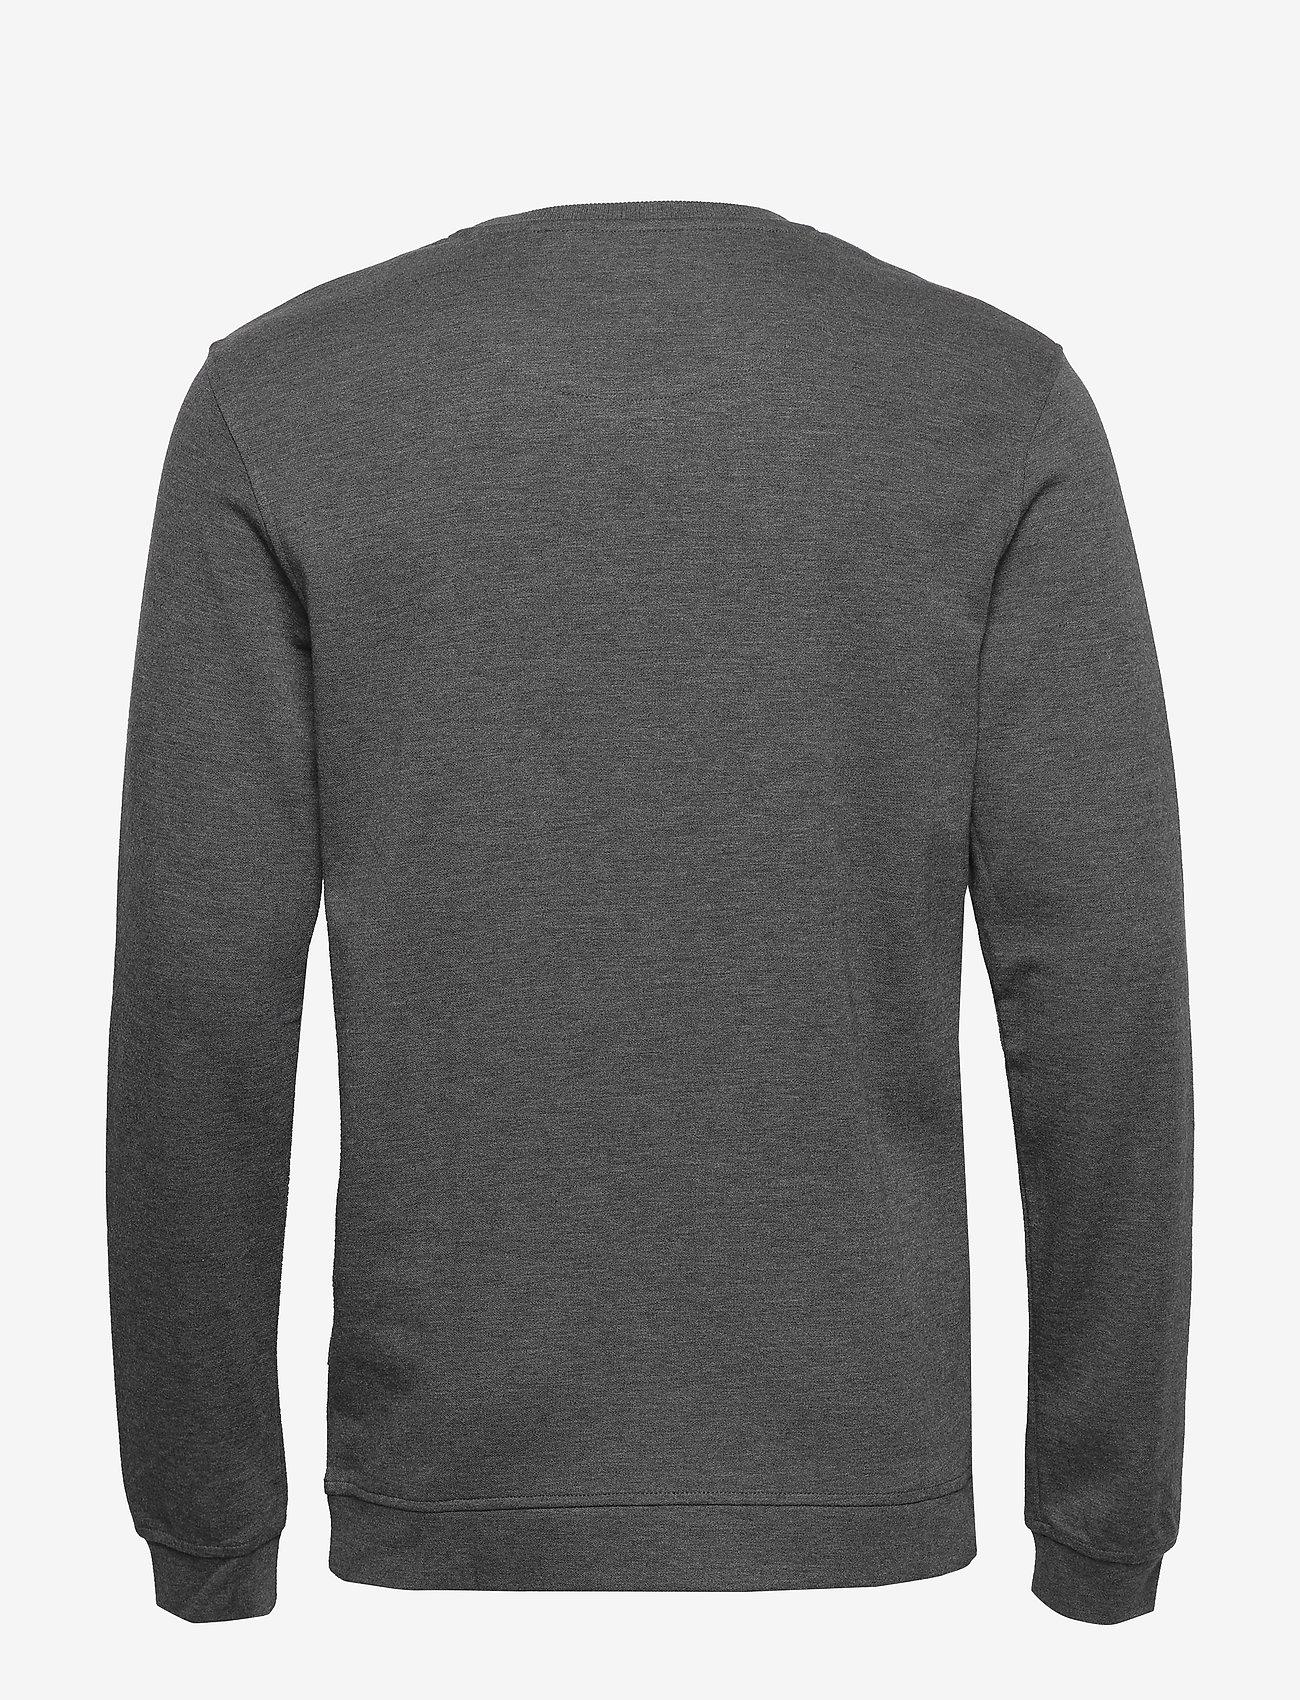 JBS of Denmark JBS of Denmark shirt bamboo - Sweatshirts DARK GRAY - Menn Klær